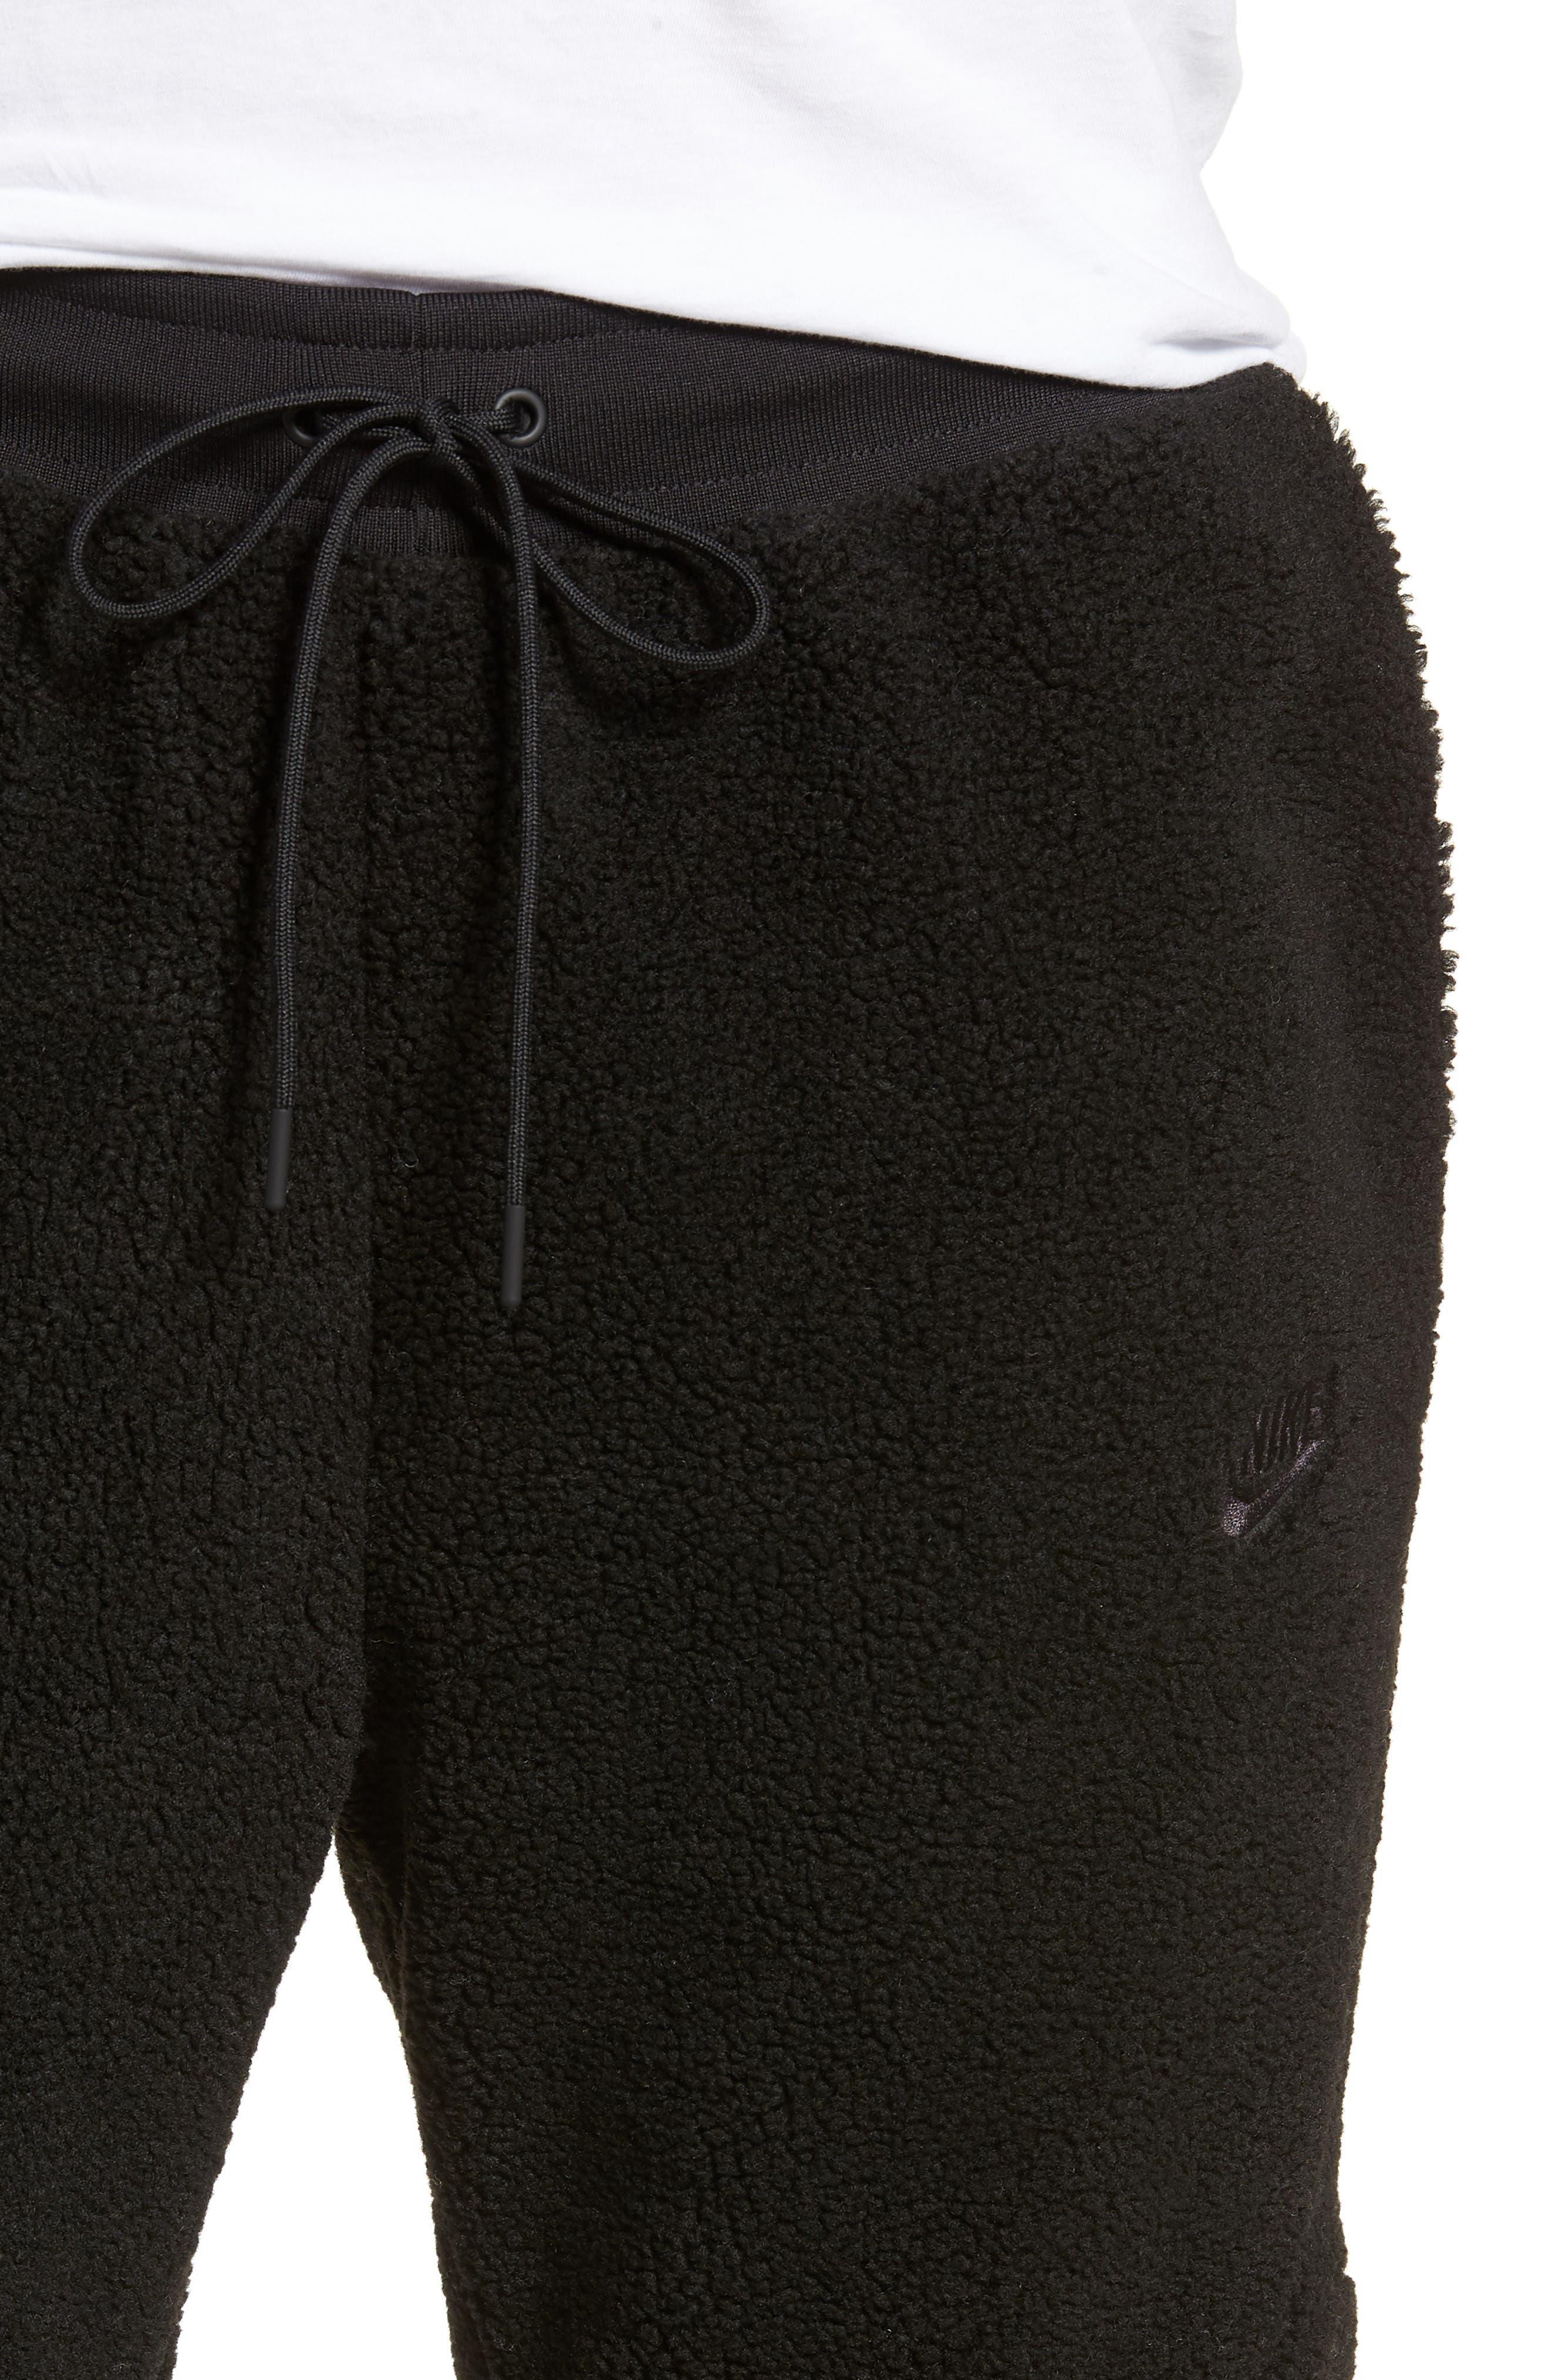 NIKE, Sportswear Tech Fleece Icon Jogger Pants, Alternate thumbnail 5, color, 010